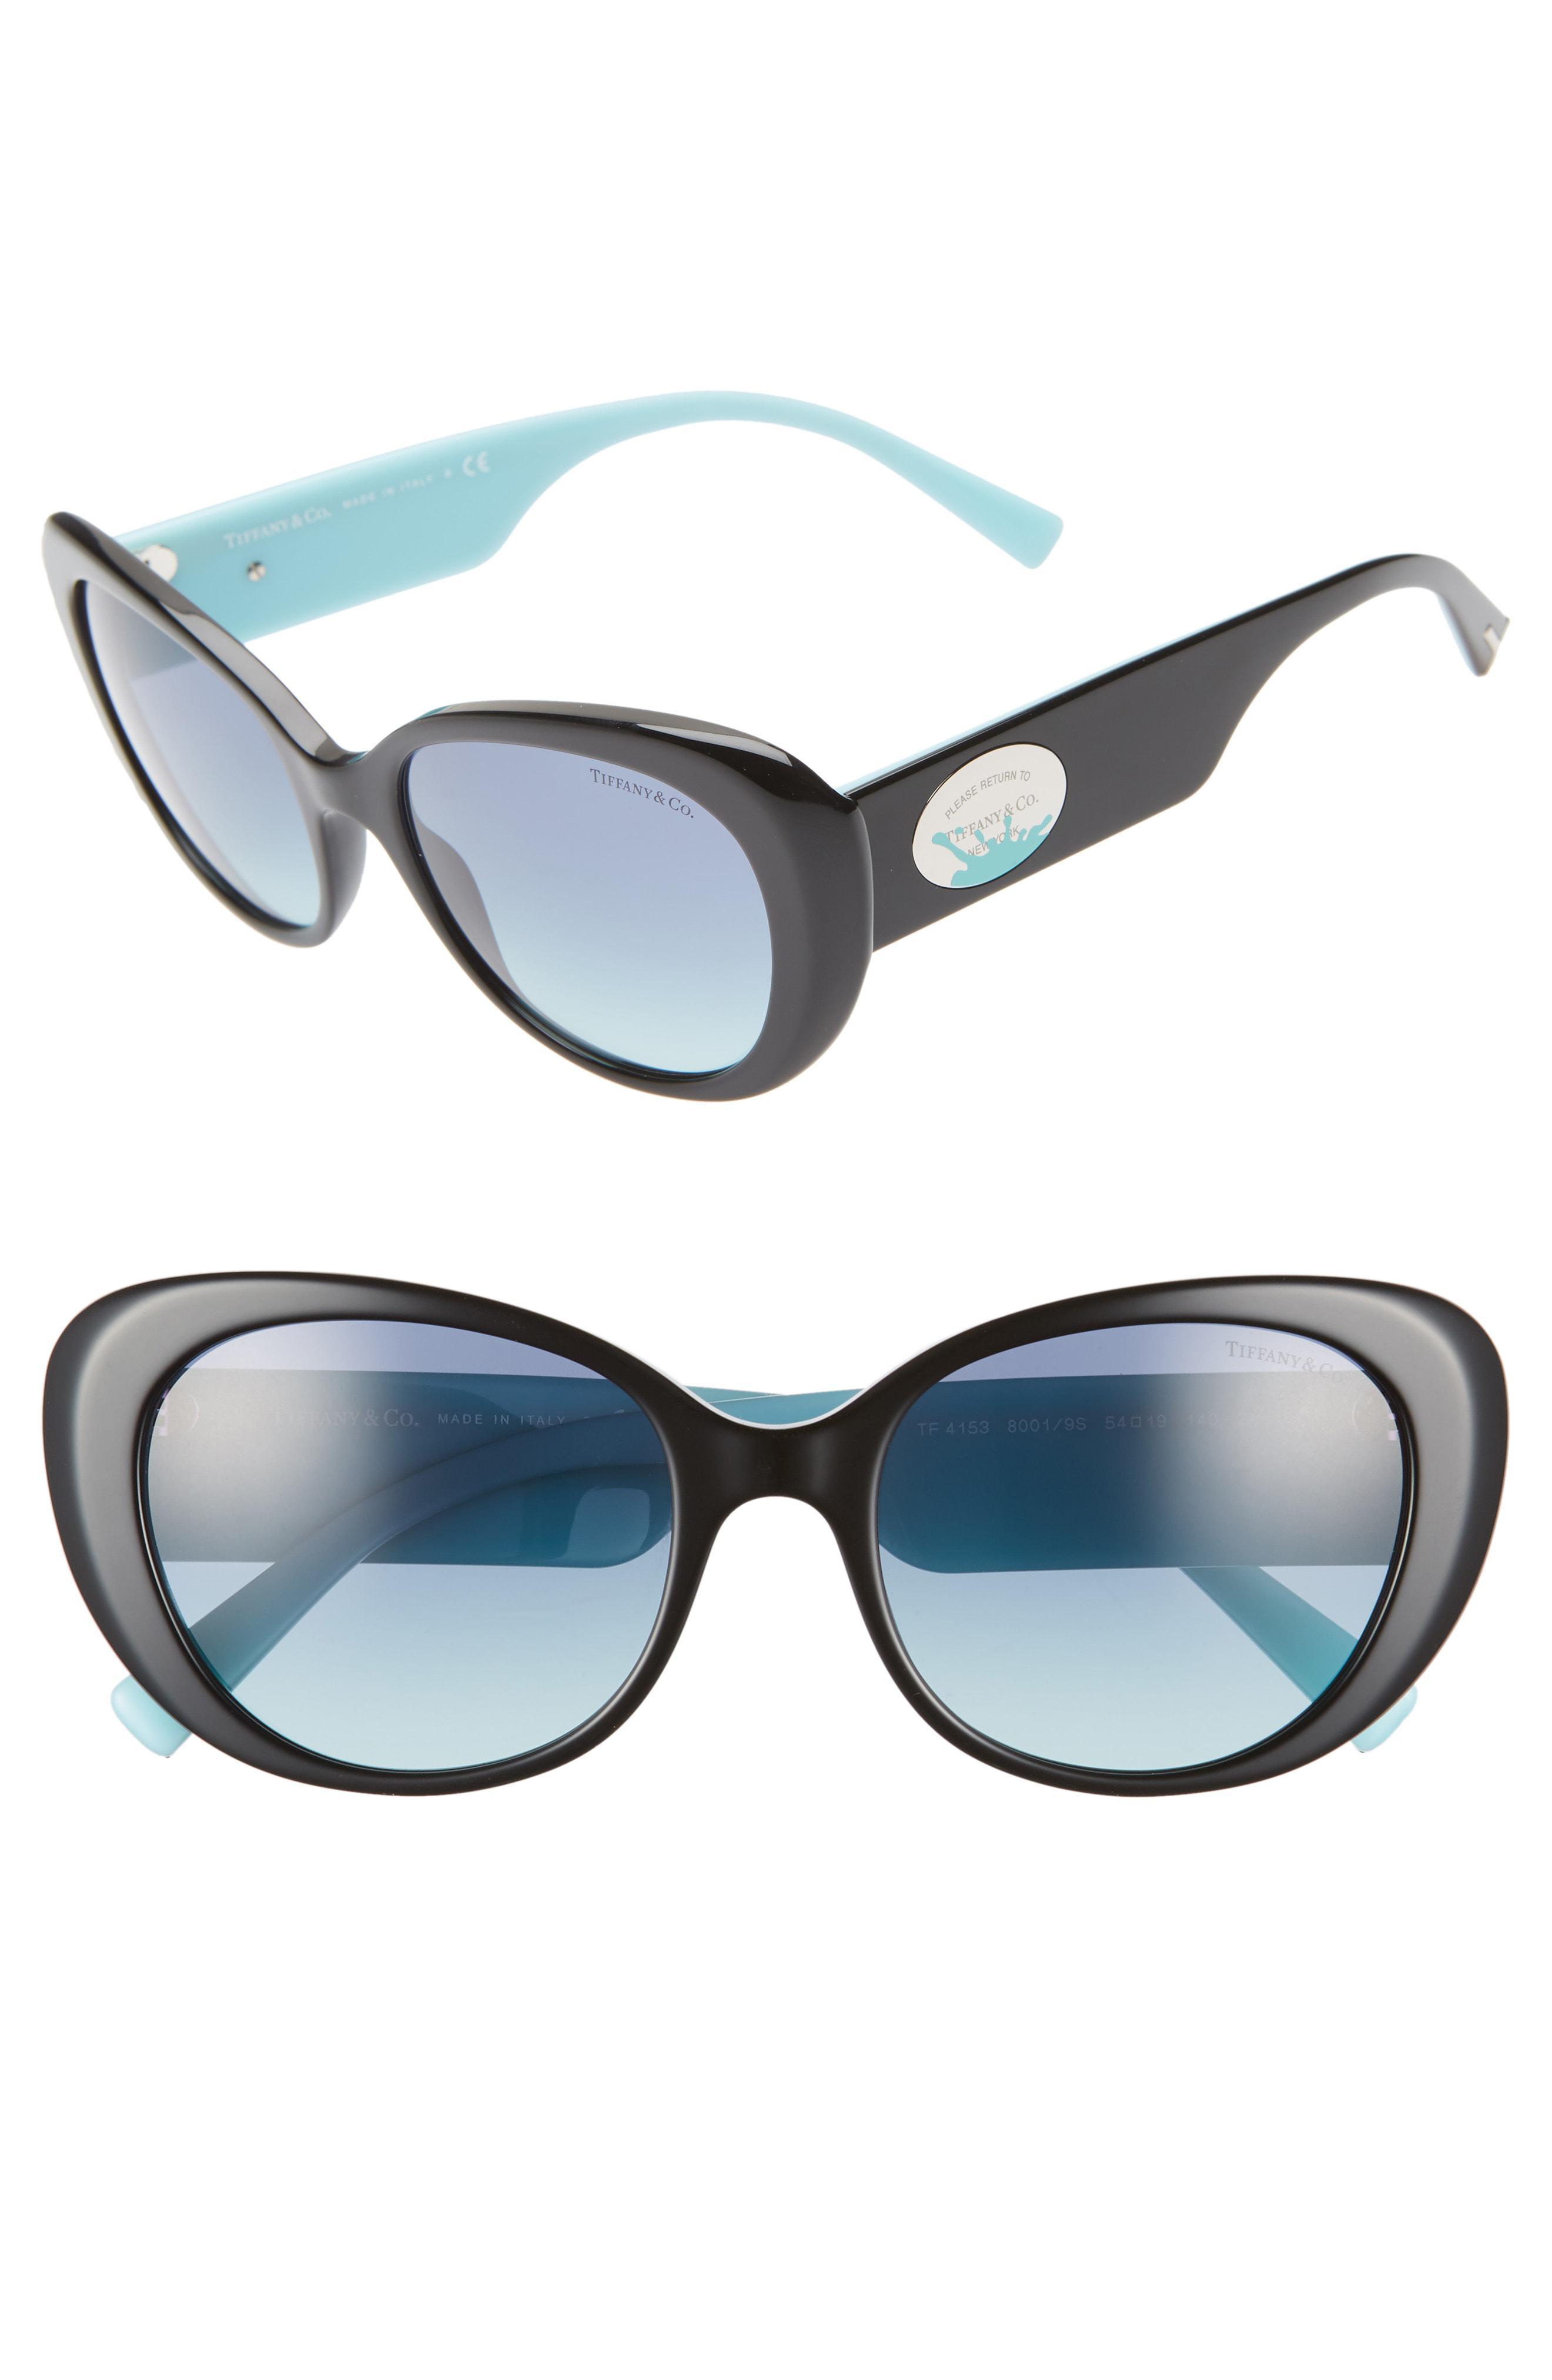 b0e1b90f0a5 Lyst - Tiffany   Co Return To Tiffany 54mm Oval Sunglasses in Blue